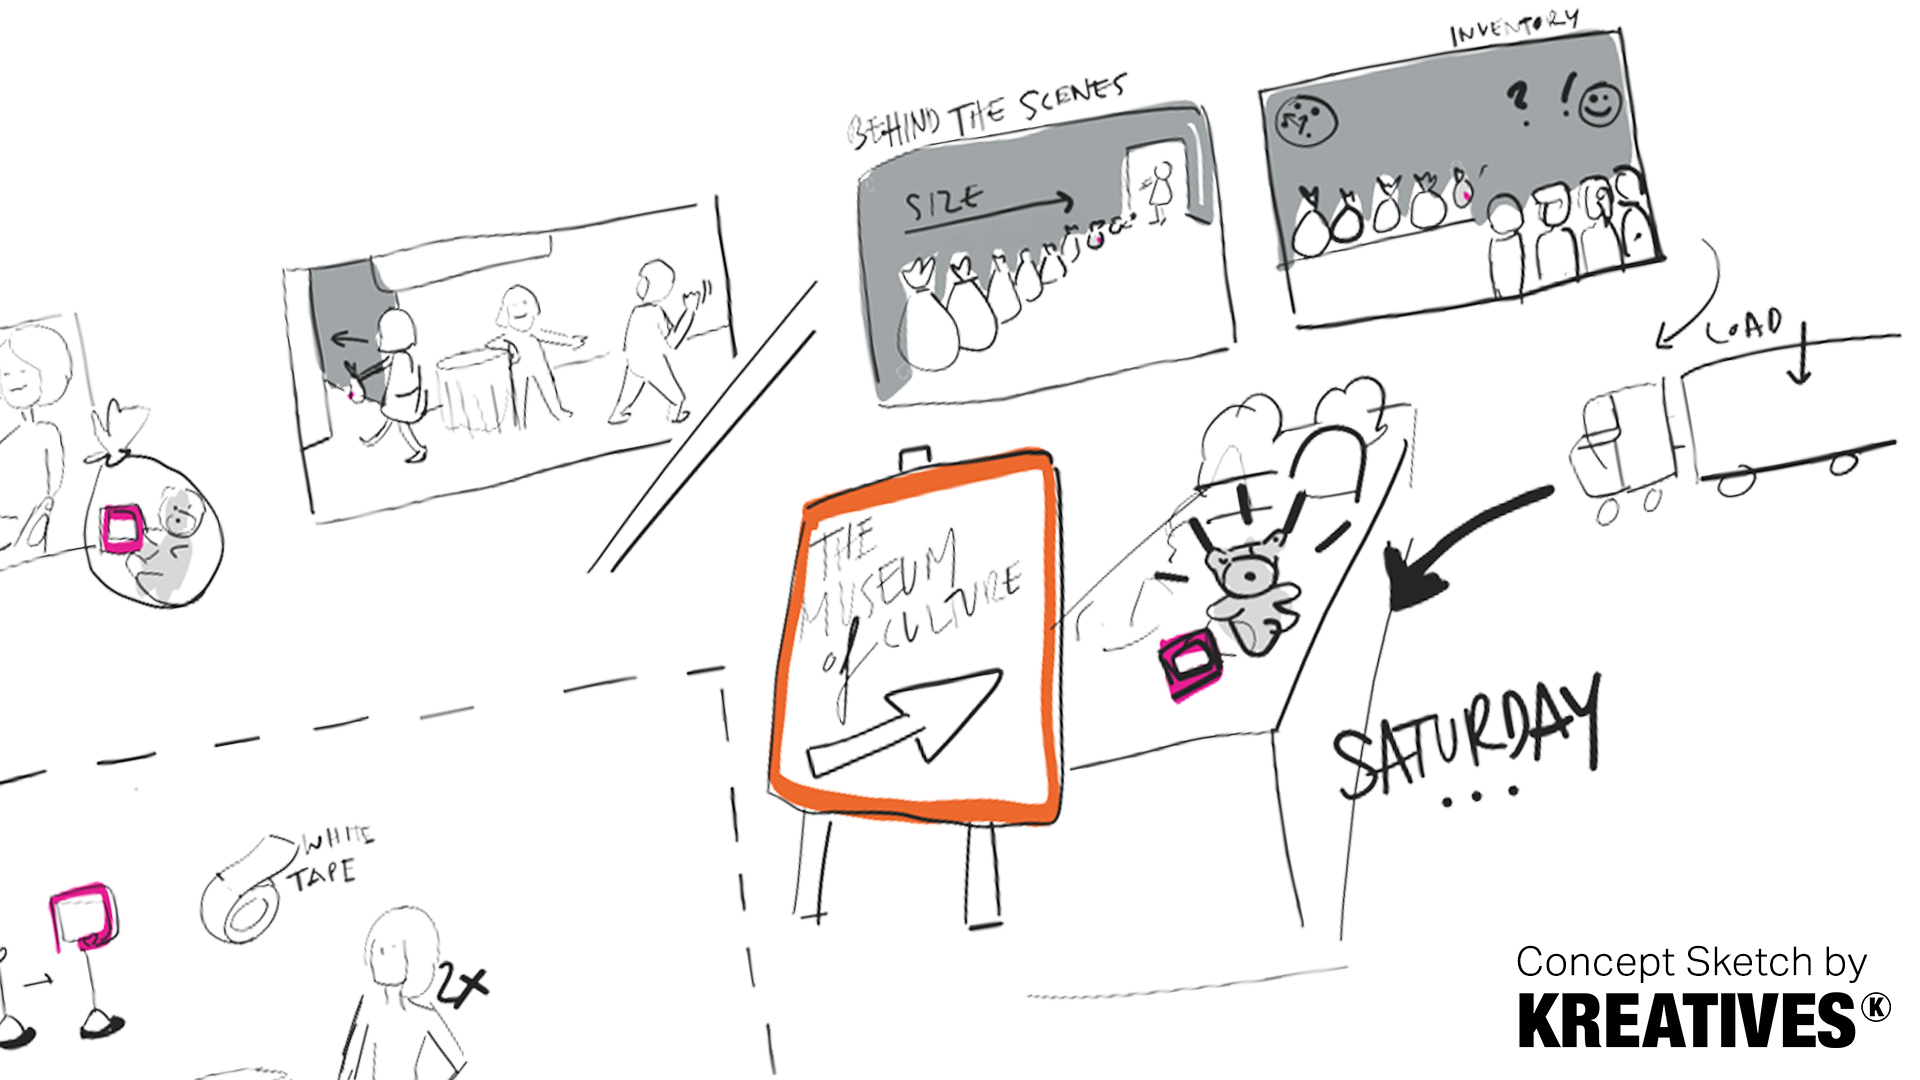 Kreatives_Singularity_Leadership_MuseumofCulture_05.jpg